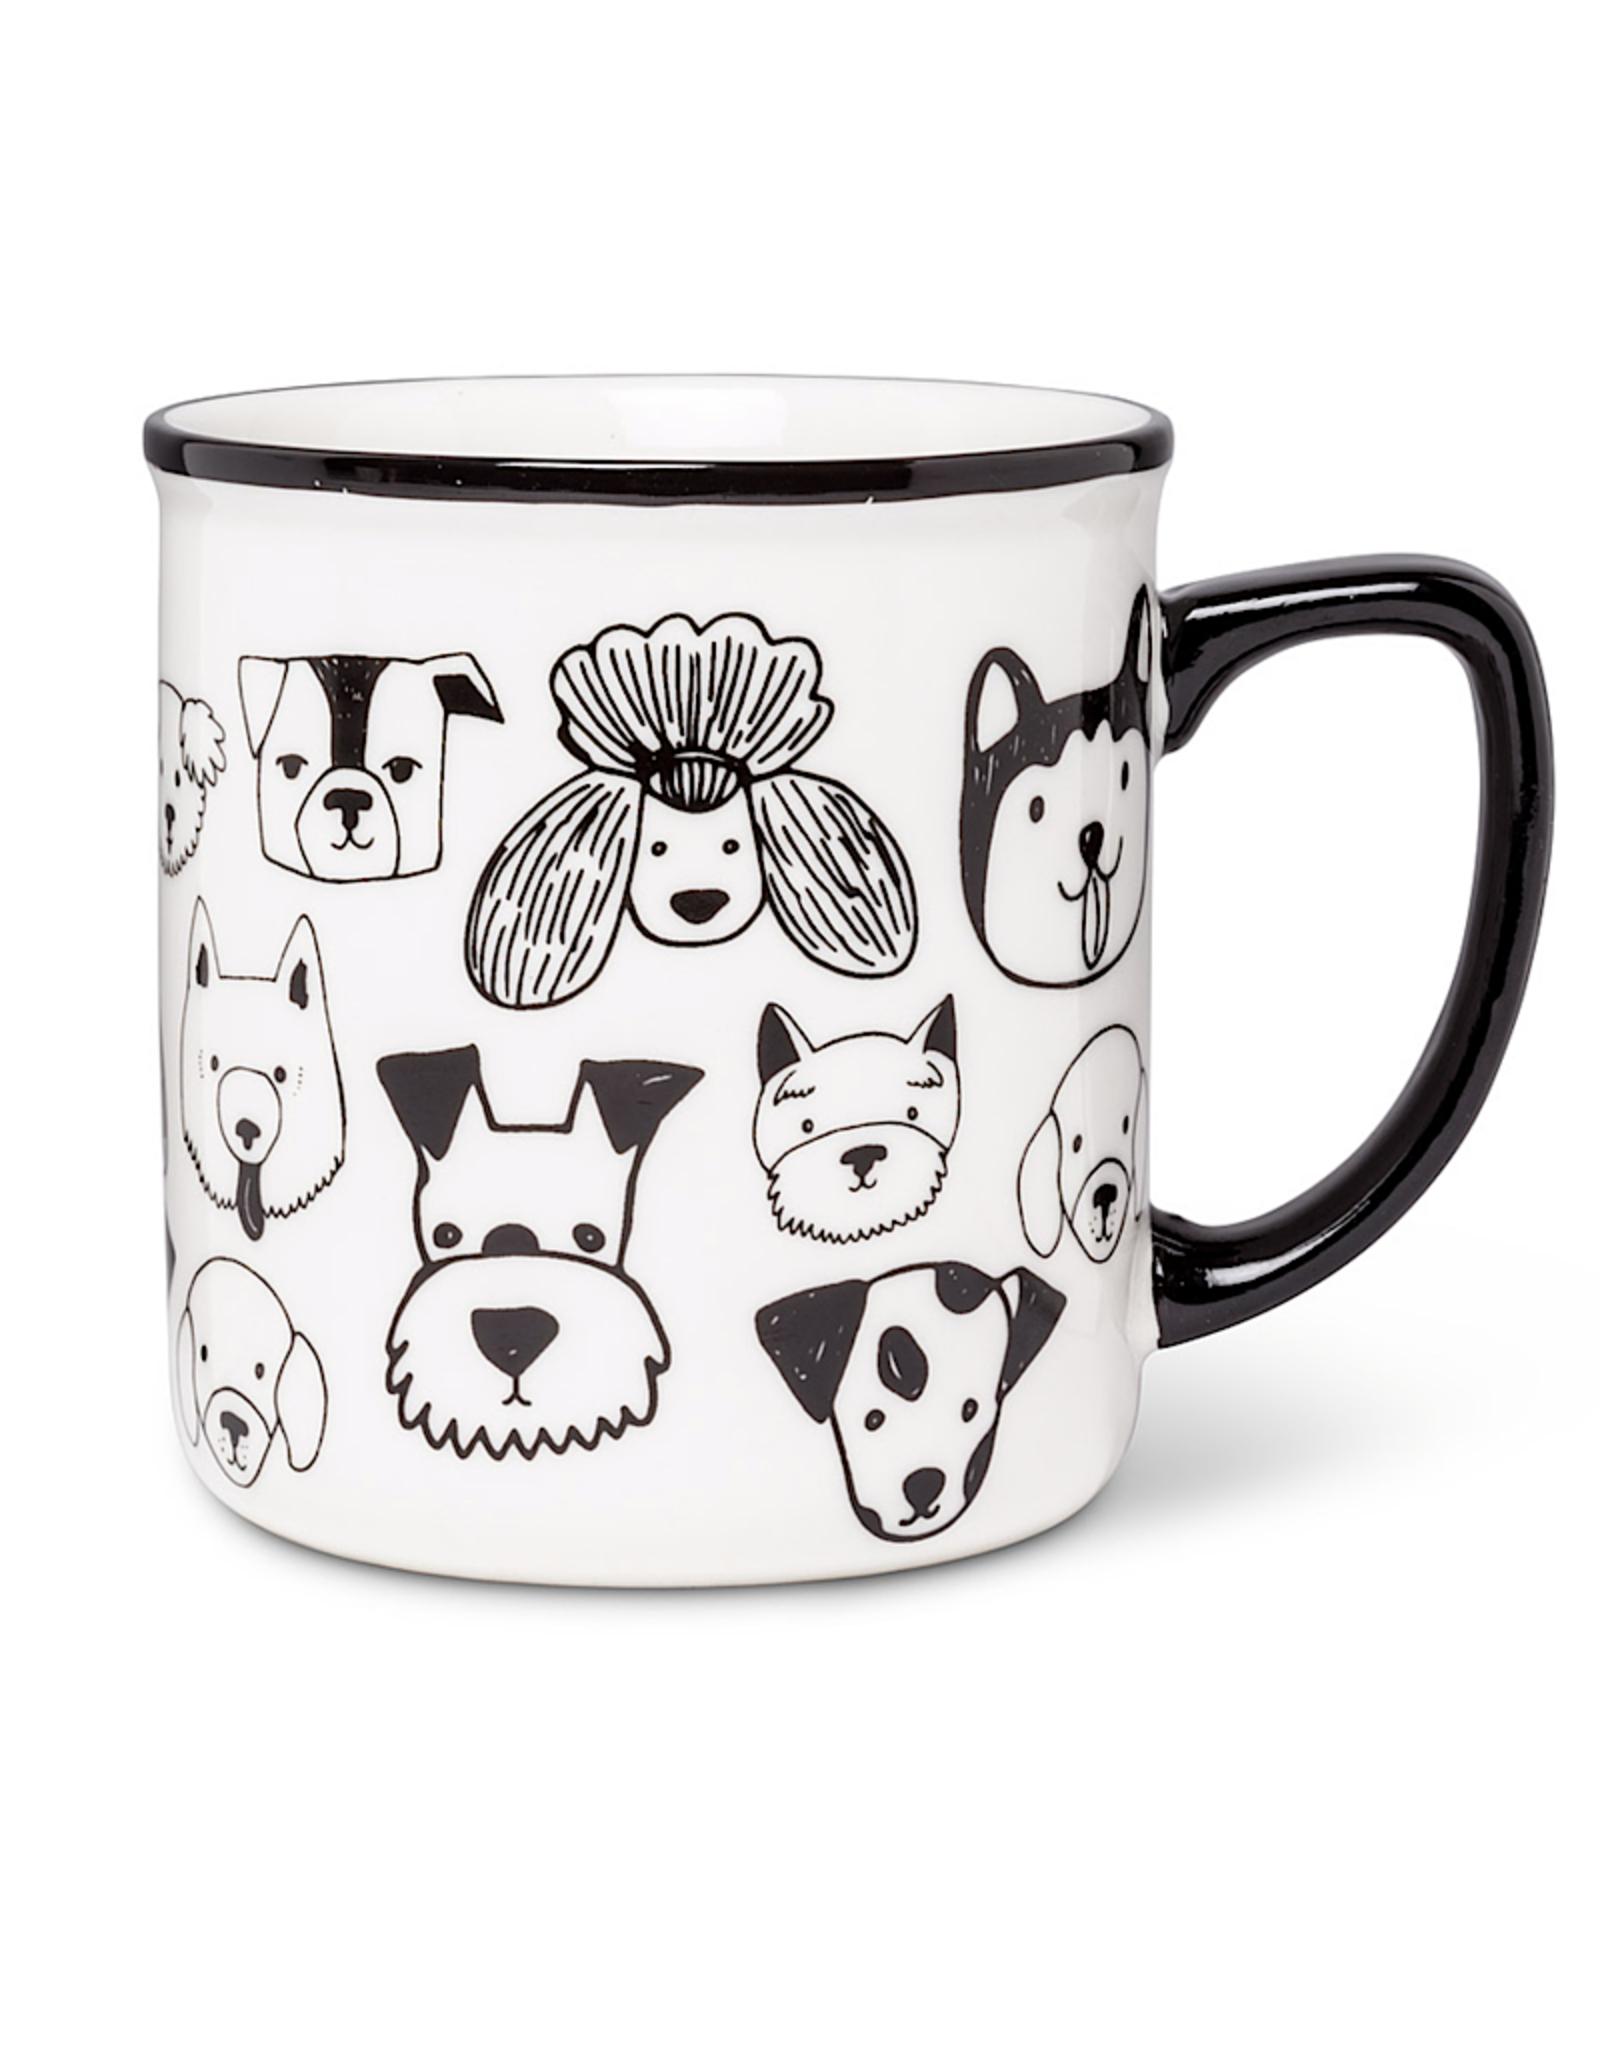 Simple Dog Face Mug